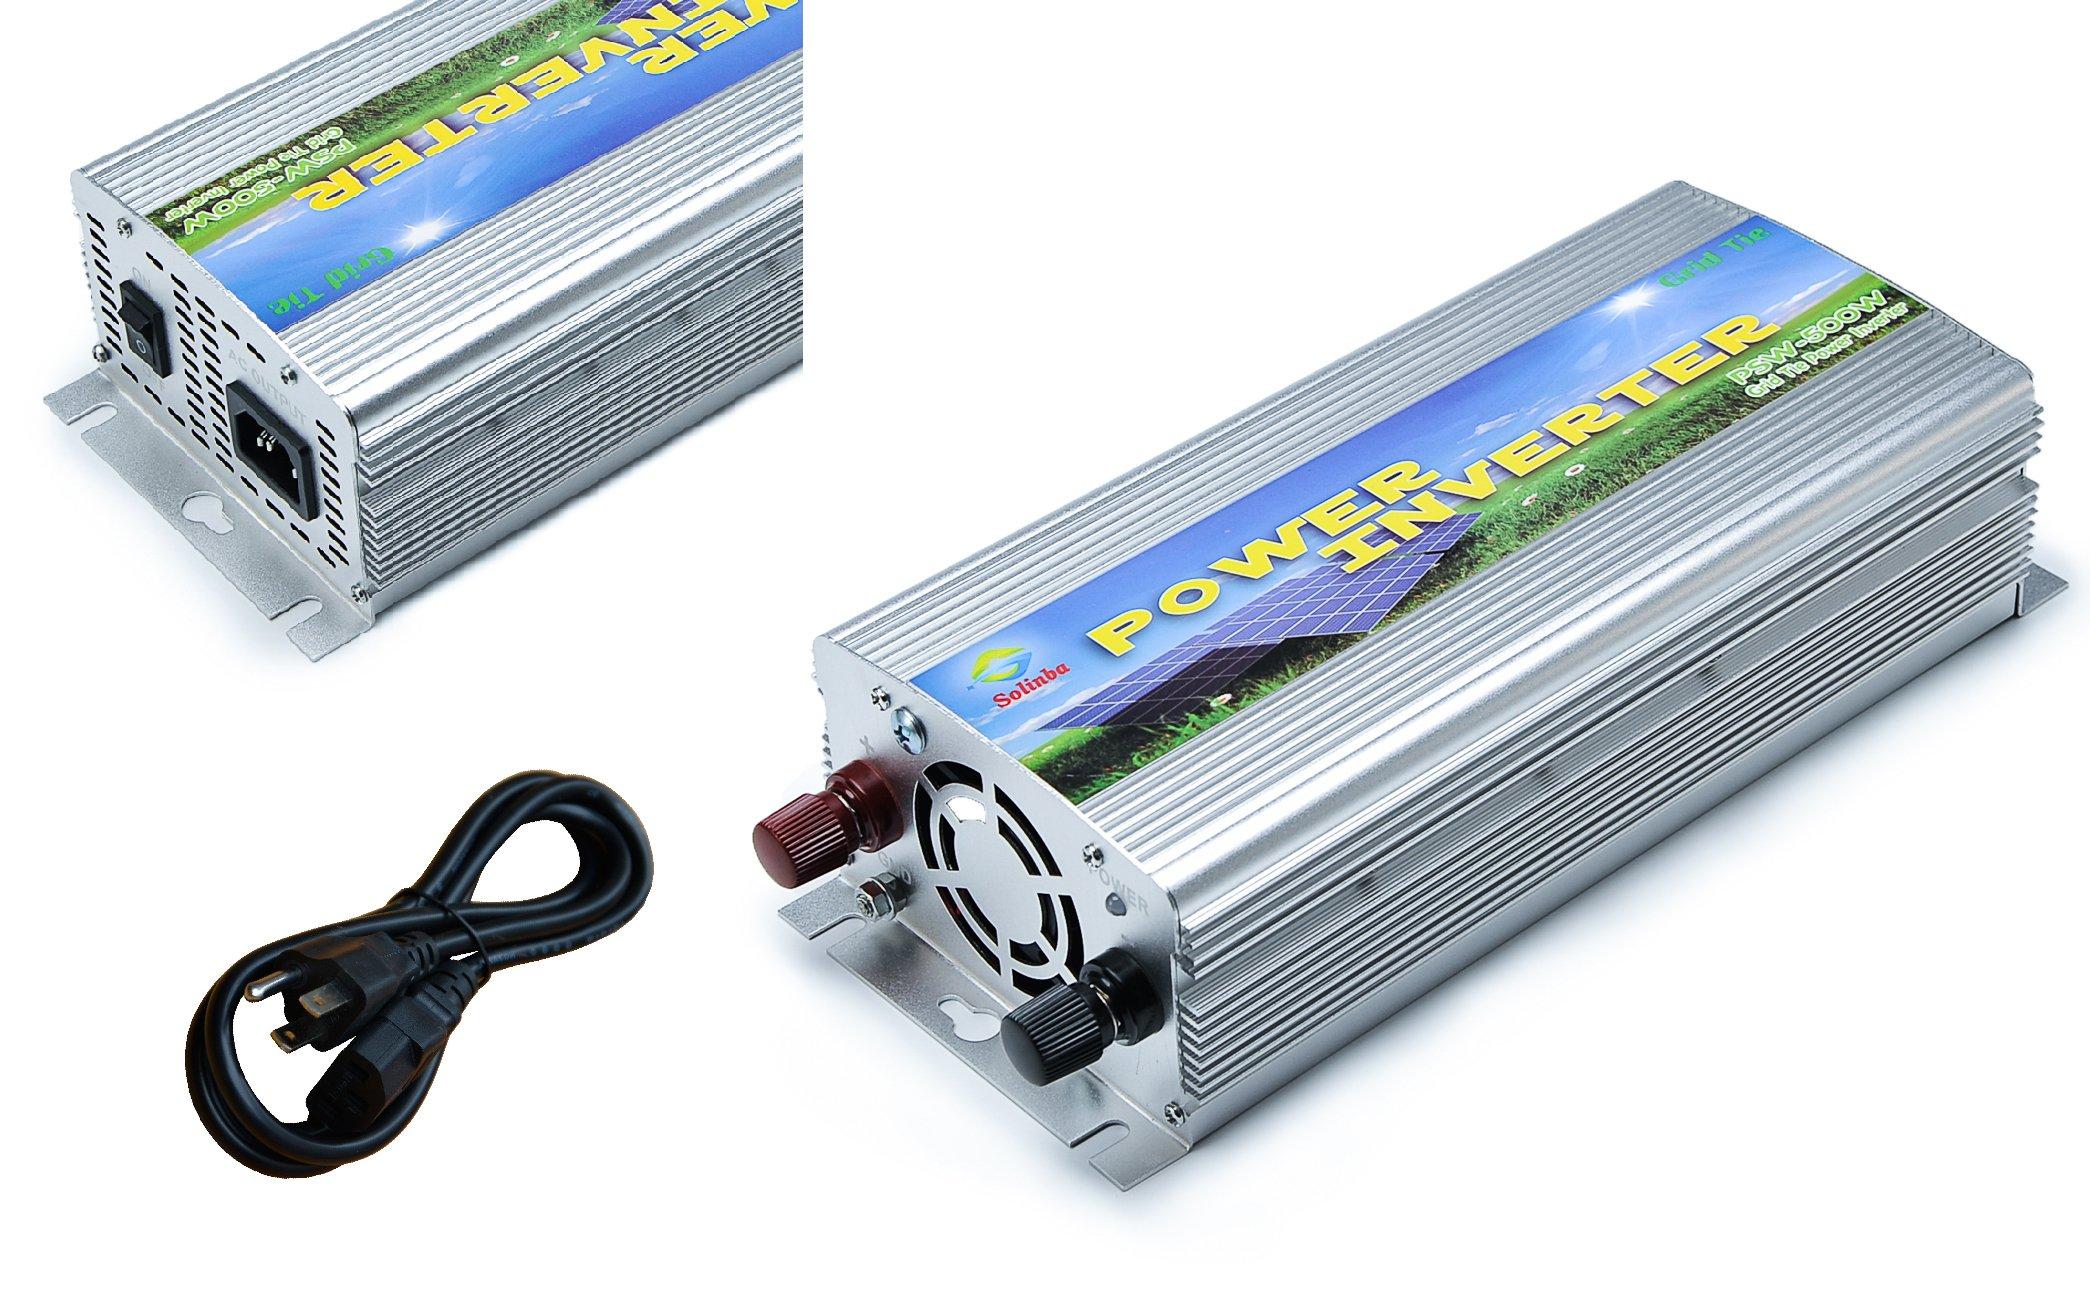 Solinba 500w Grid Tie Inverter for Solar Inverter, Solar Generator, Mppt, Silver, USA, DC11-28v to AC 220v